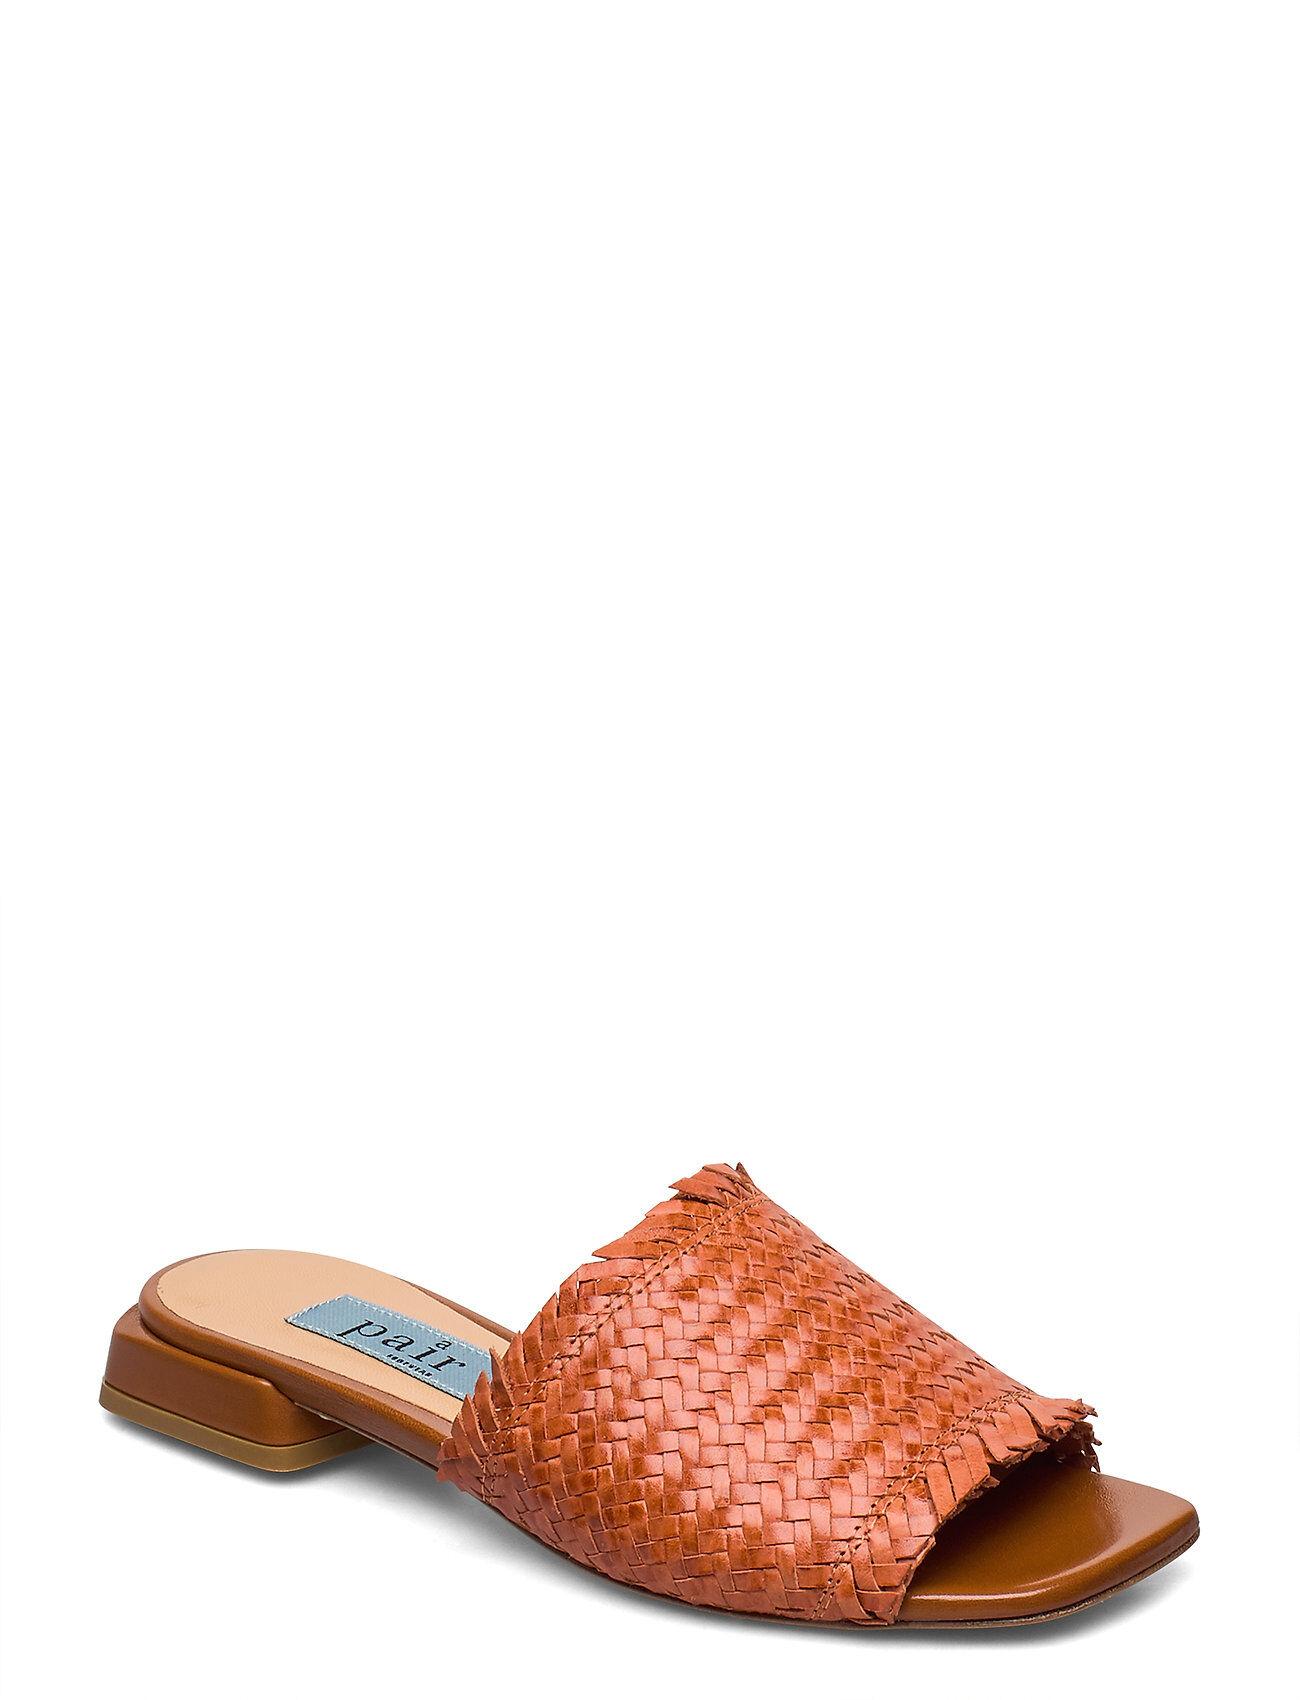 Apair Braided Flat Sandal Shoes Summer Shoes Flat Sandals Ruskea Apair